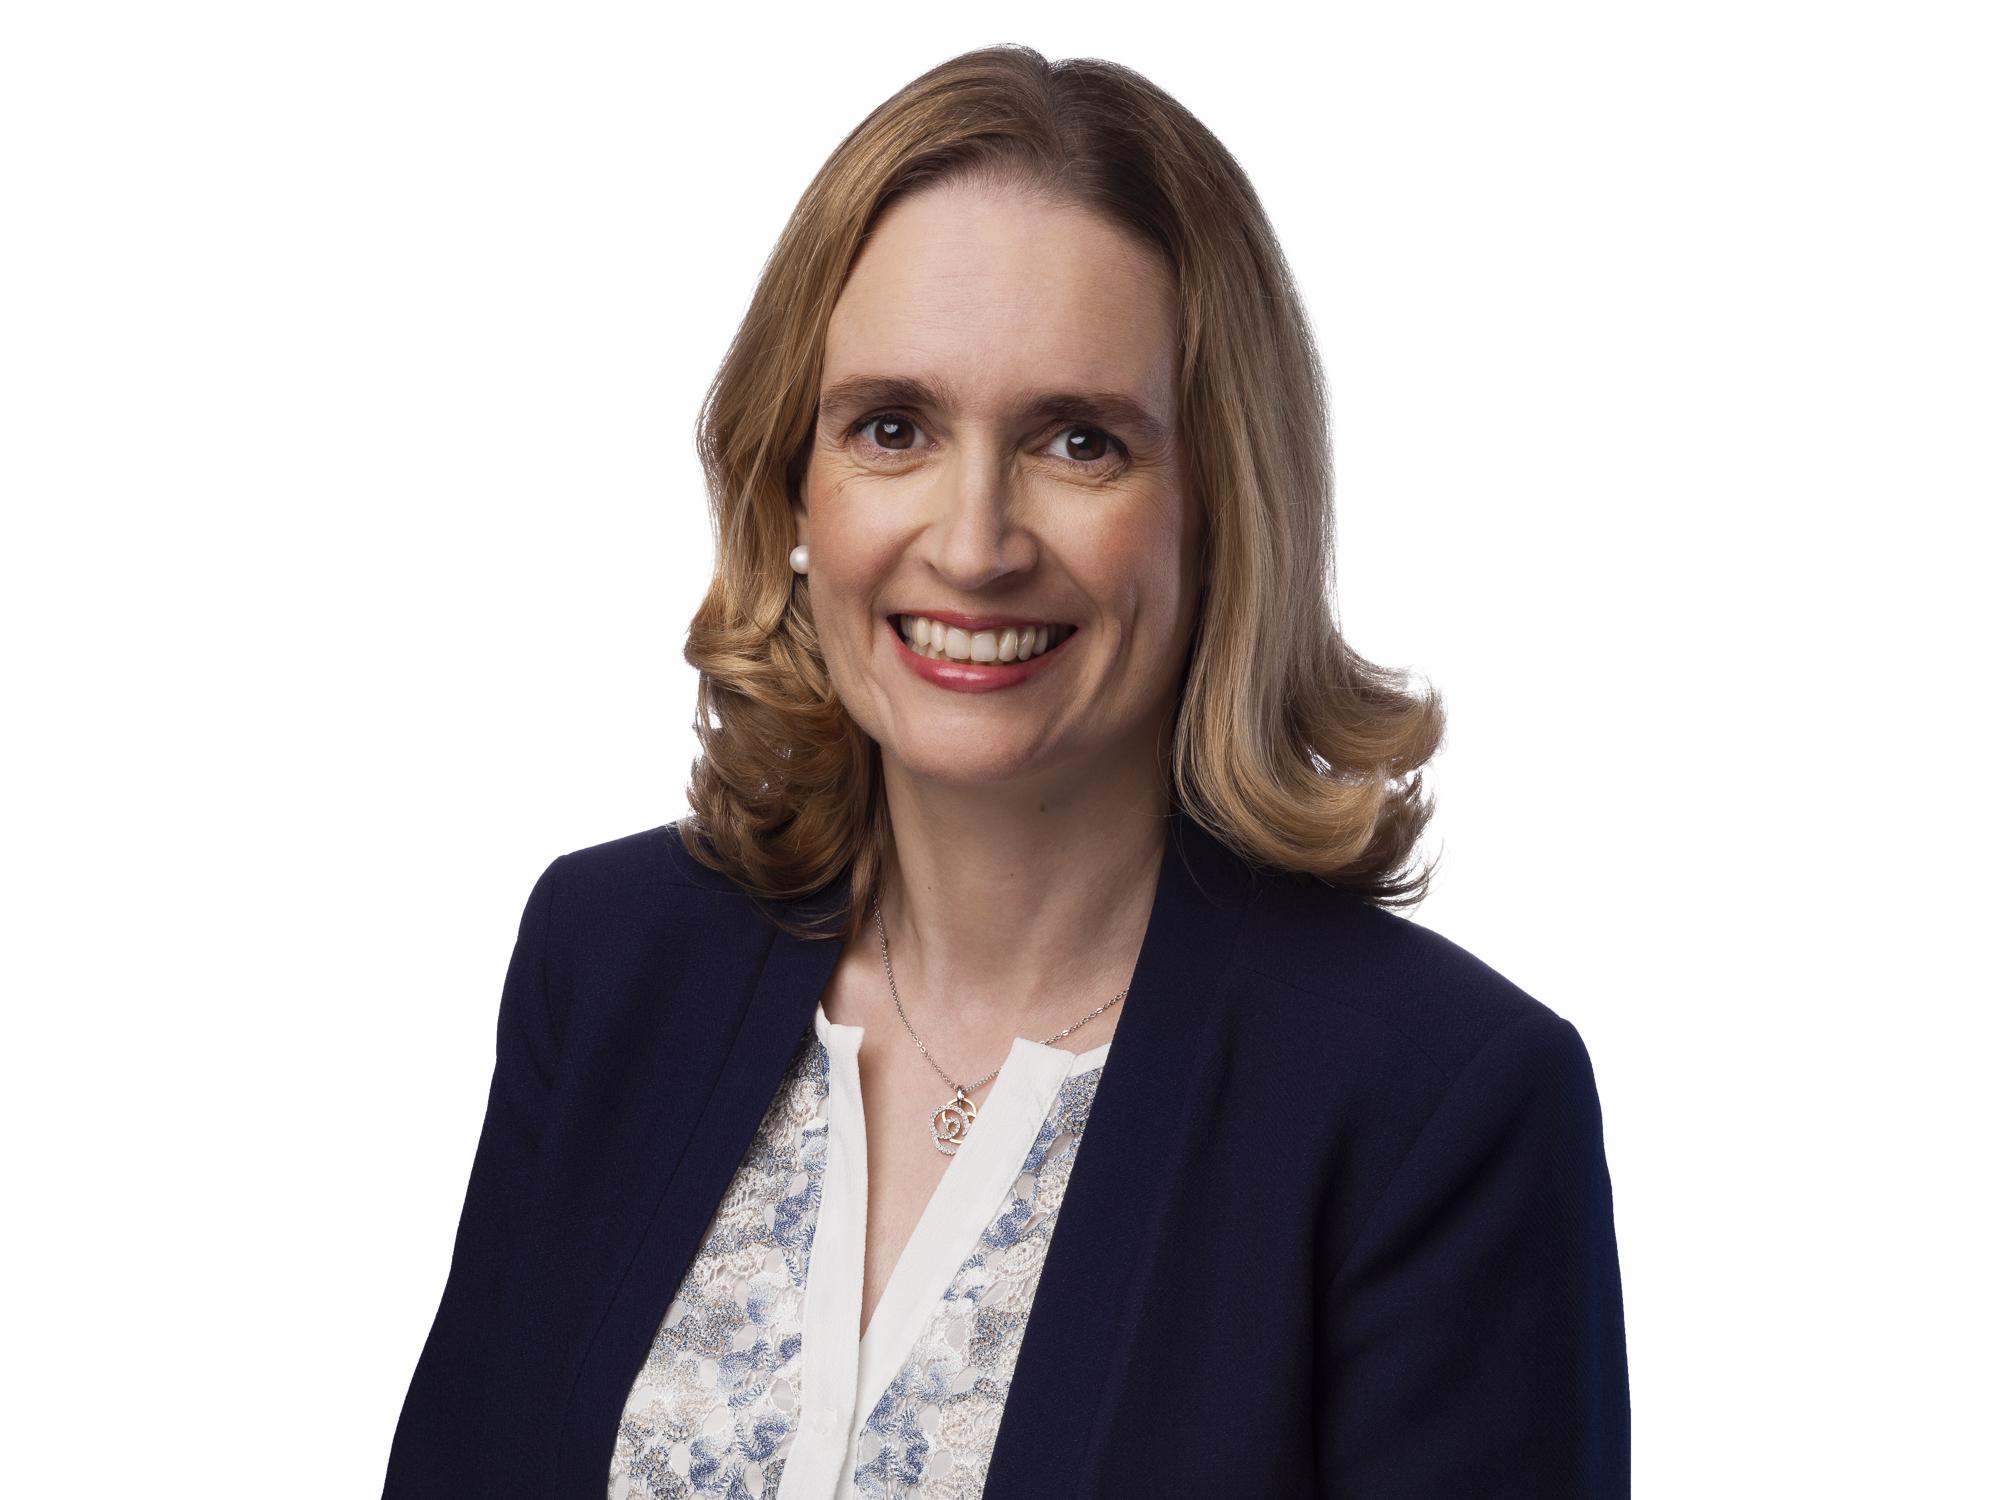 Cristina Borges Correia